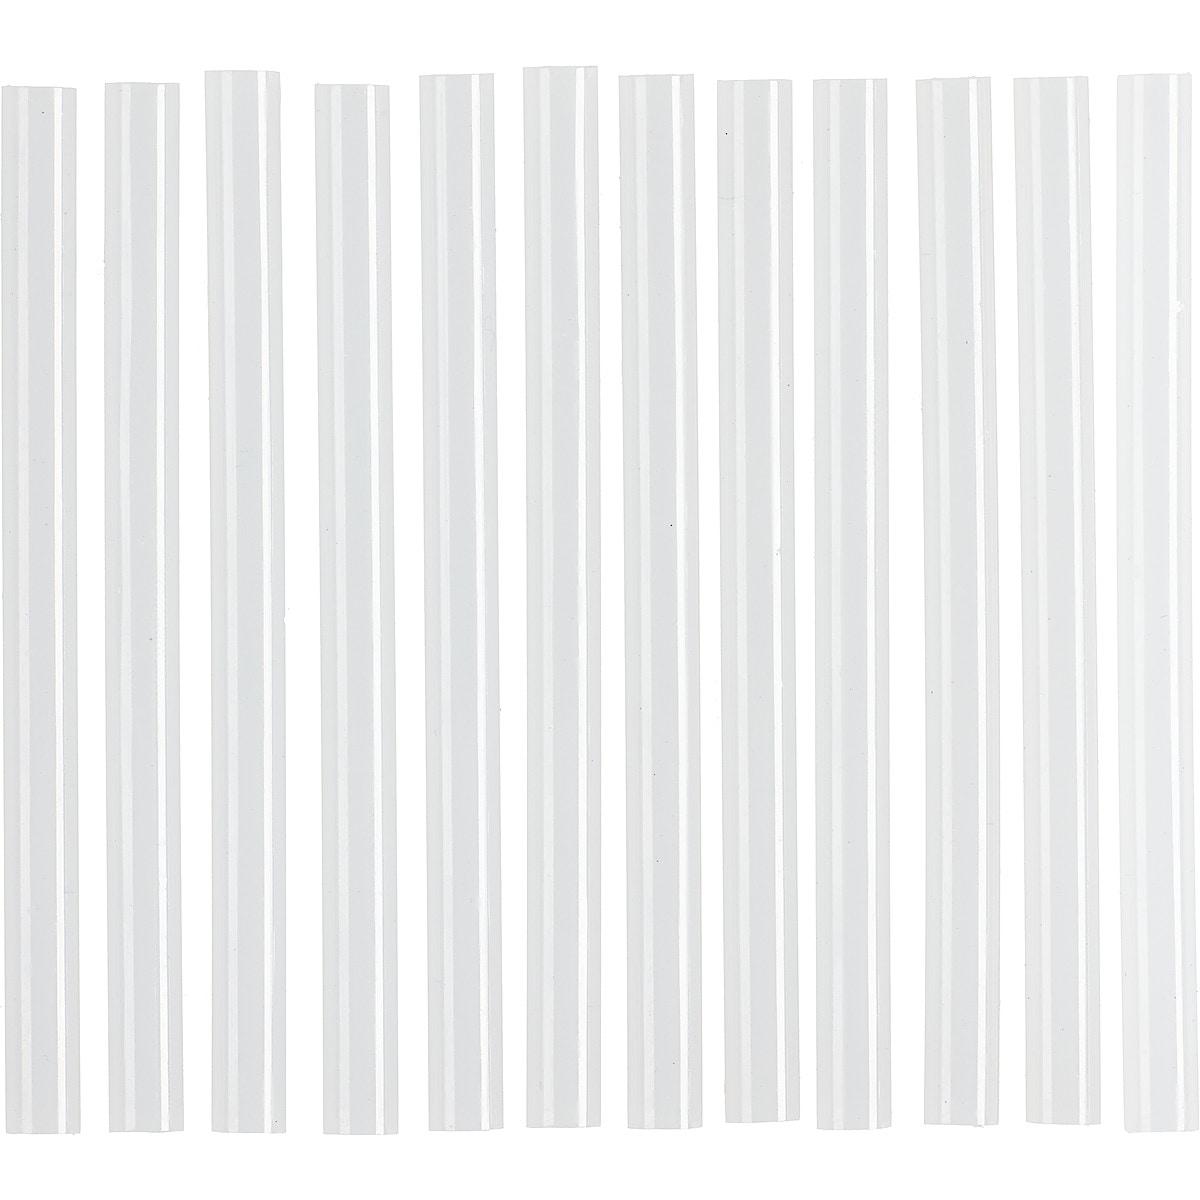 Limpatroner 7 x 100 mm